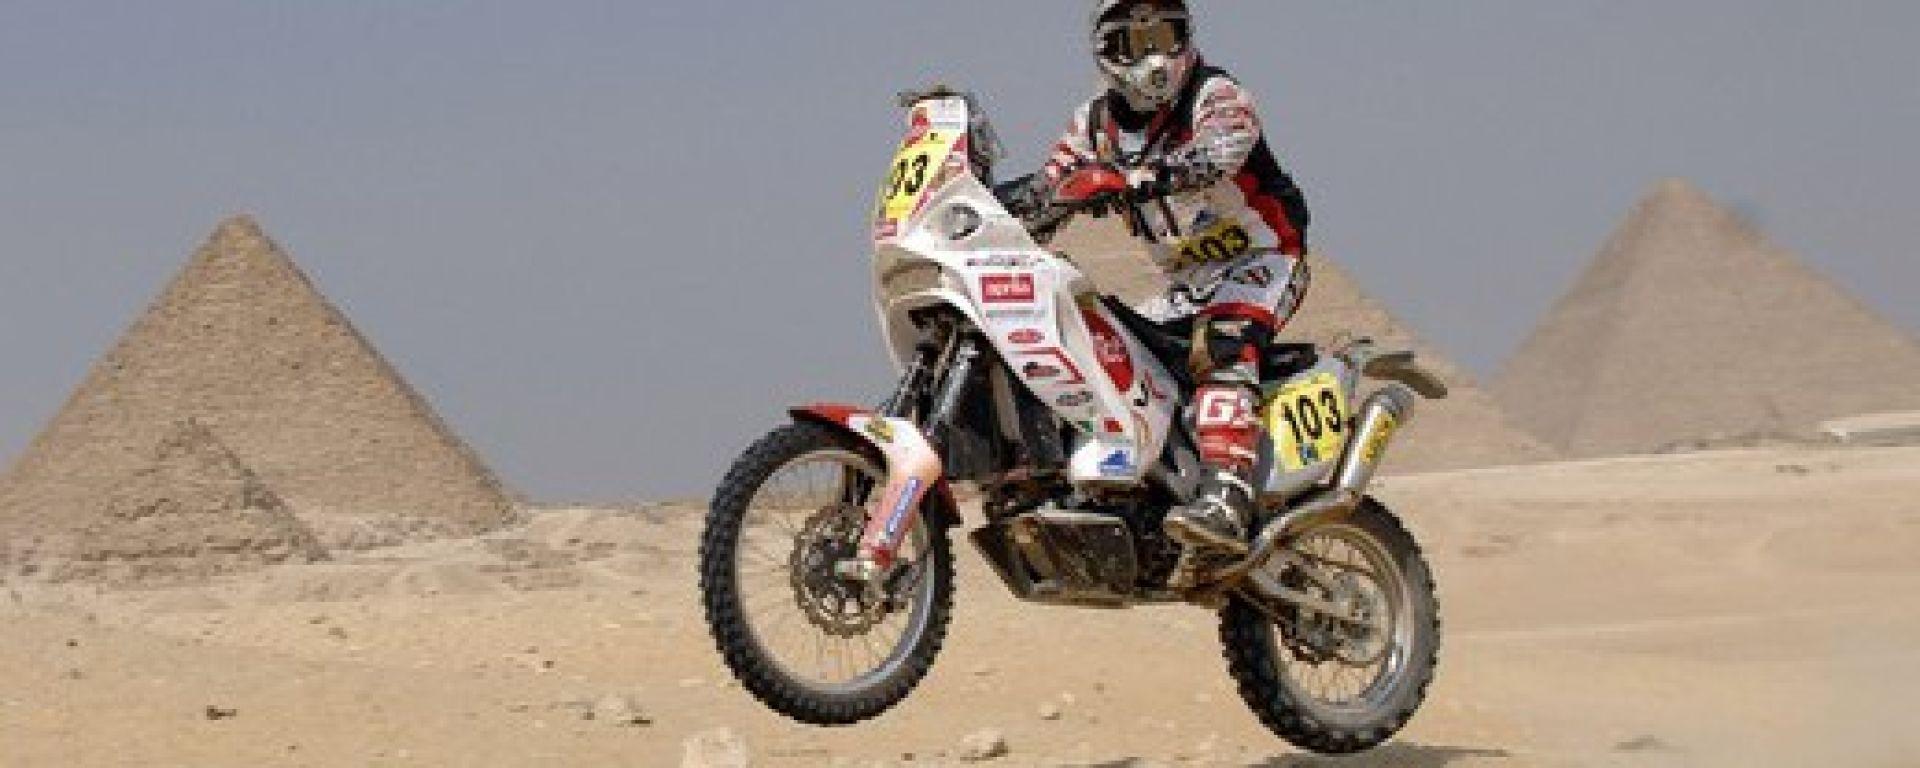 Aprilia RXV Dakar